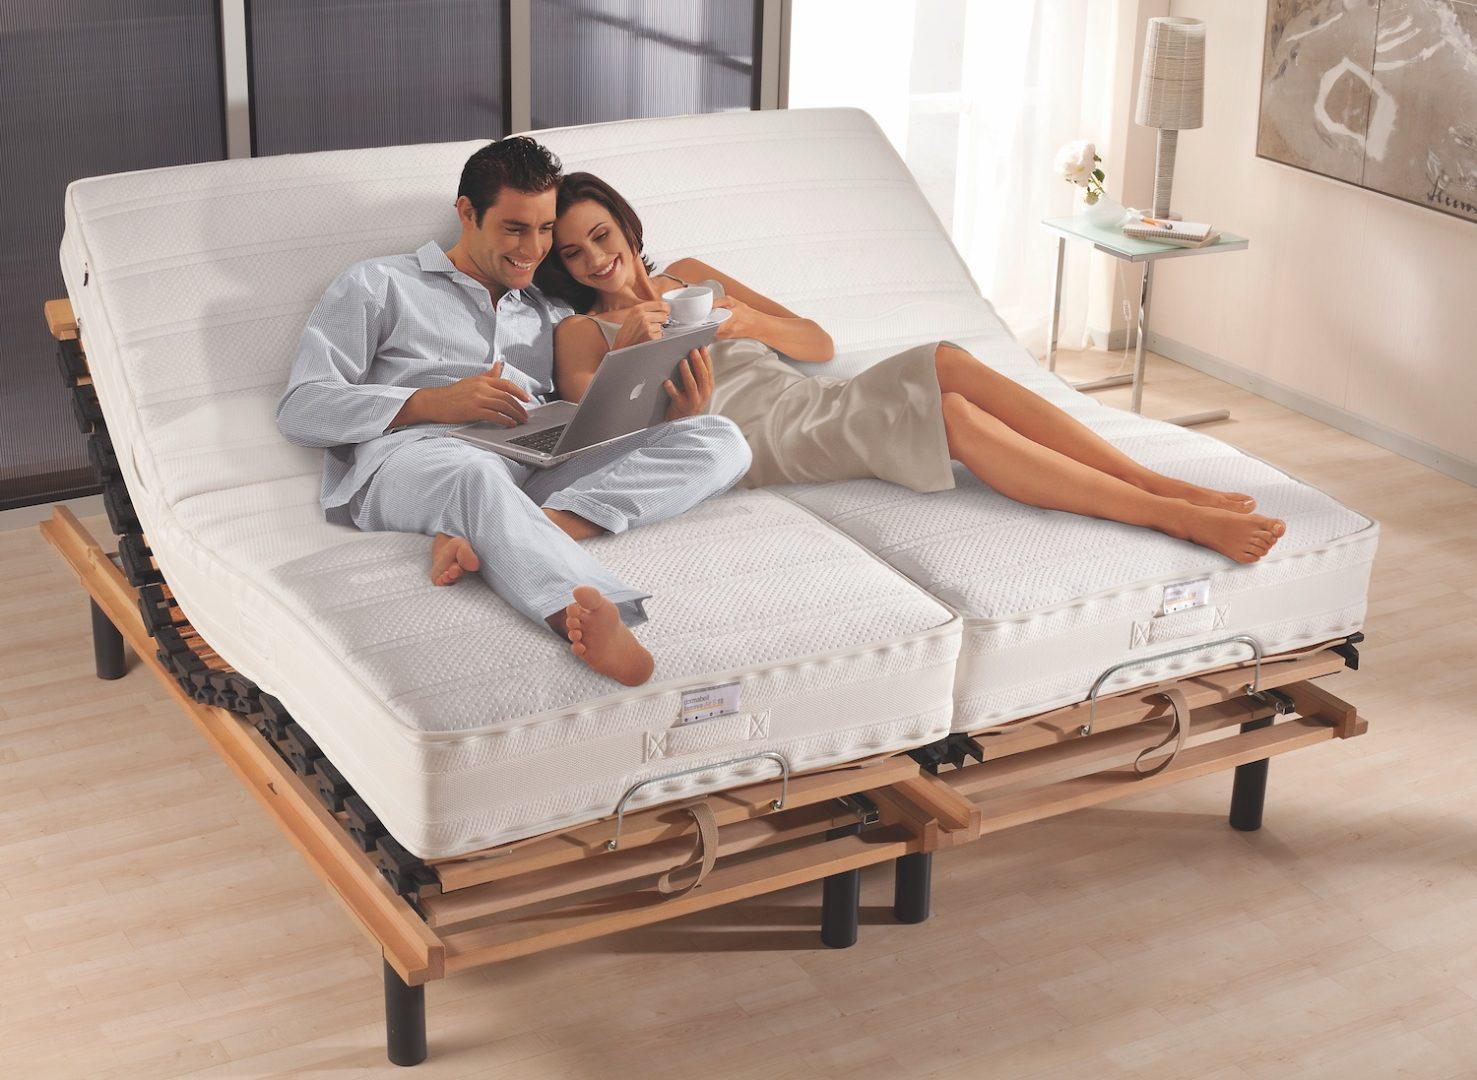 Paar auf Bett: Lattenrost erfüllt mehrere Funktionen